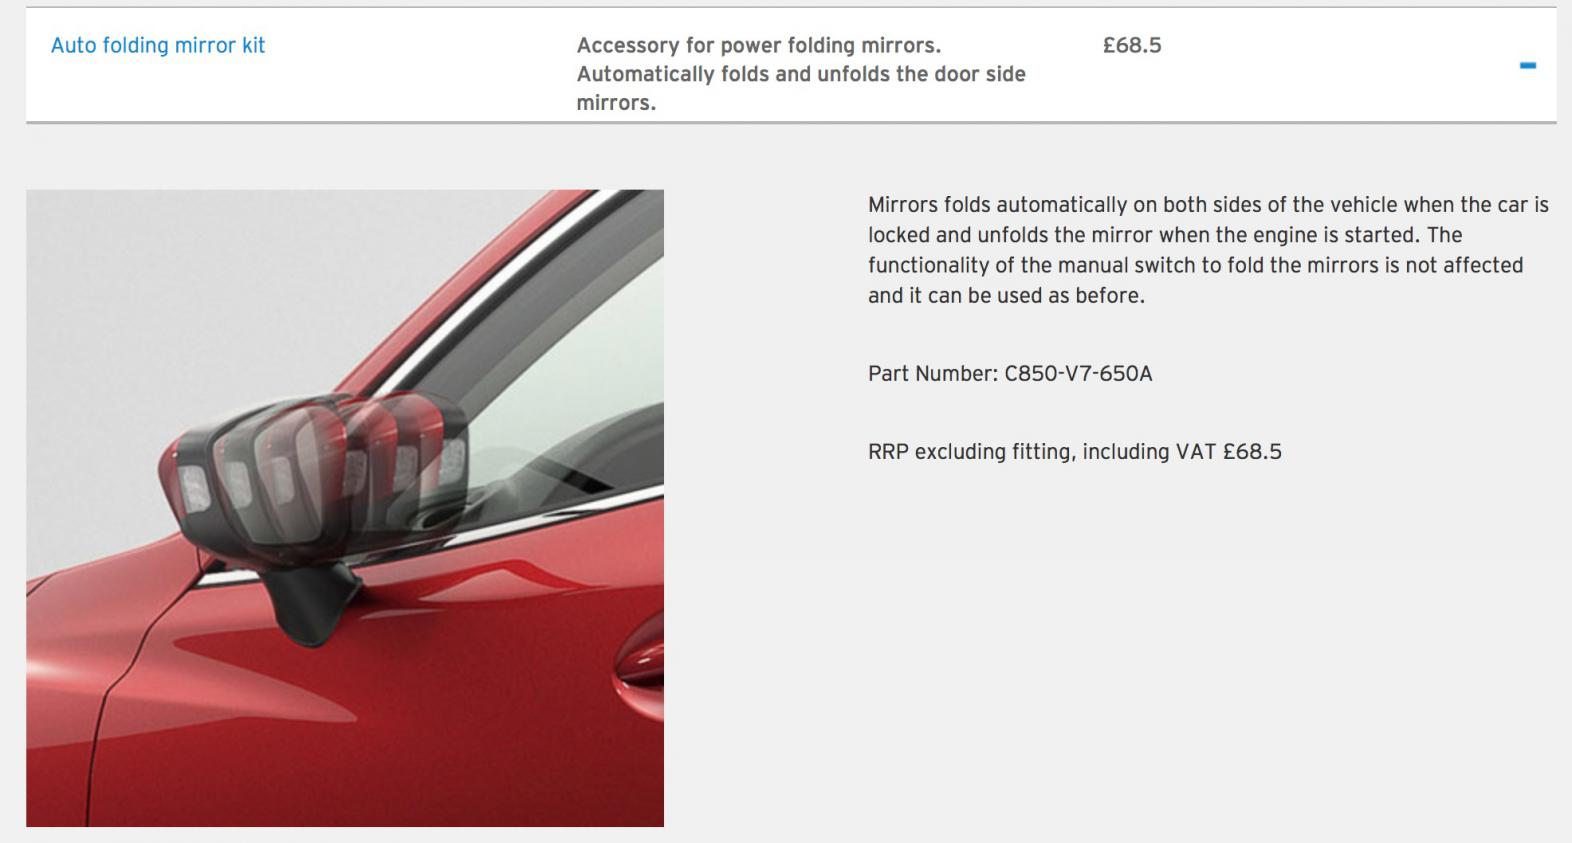 Genuine Mazda 2 2015 onwards Auto Folding Mirror Kit C850-V7-650A